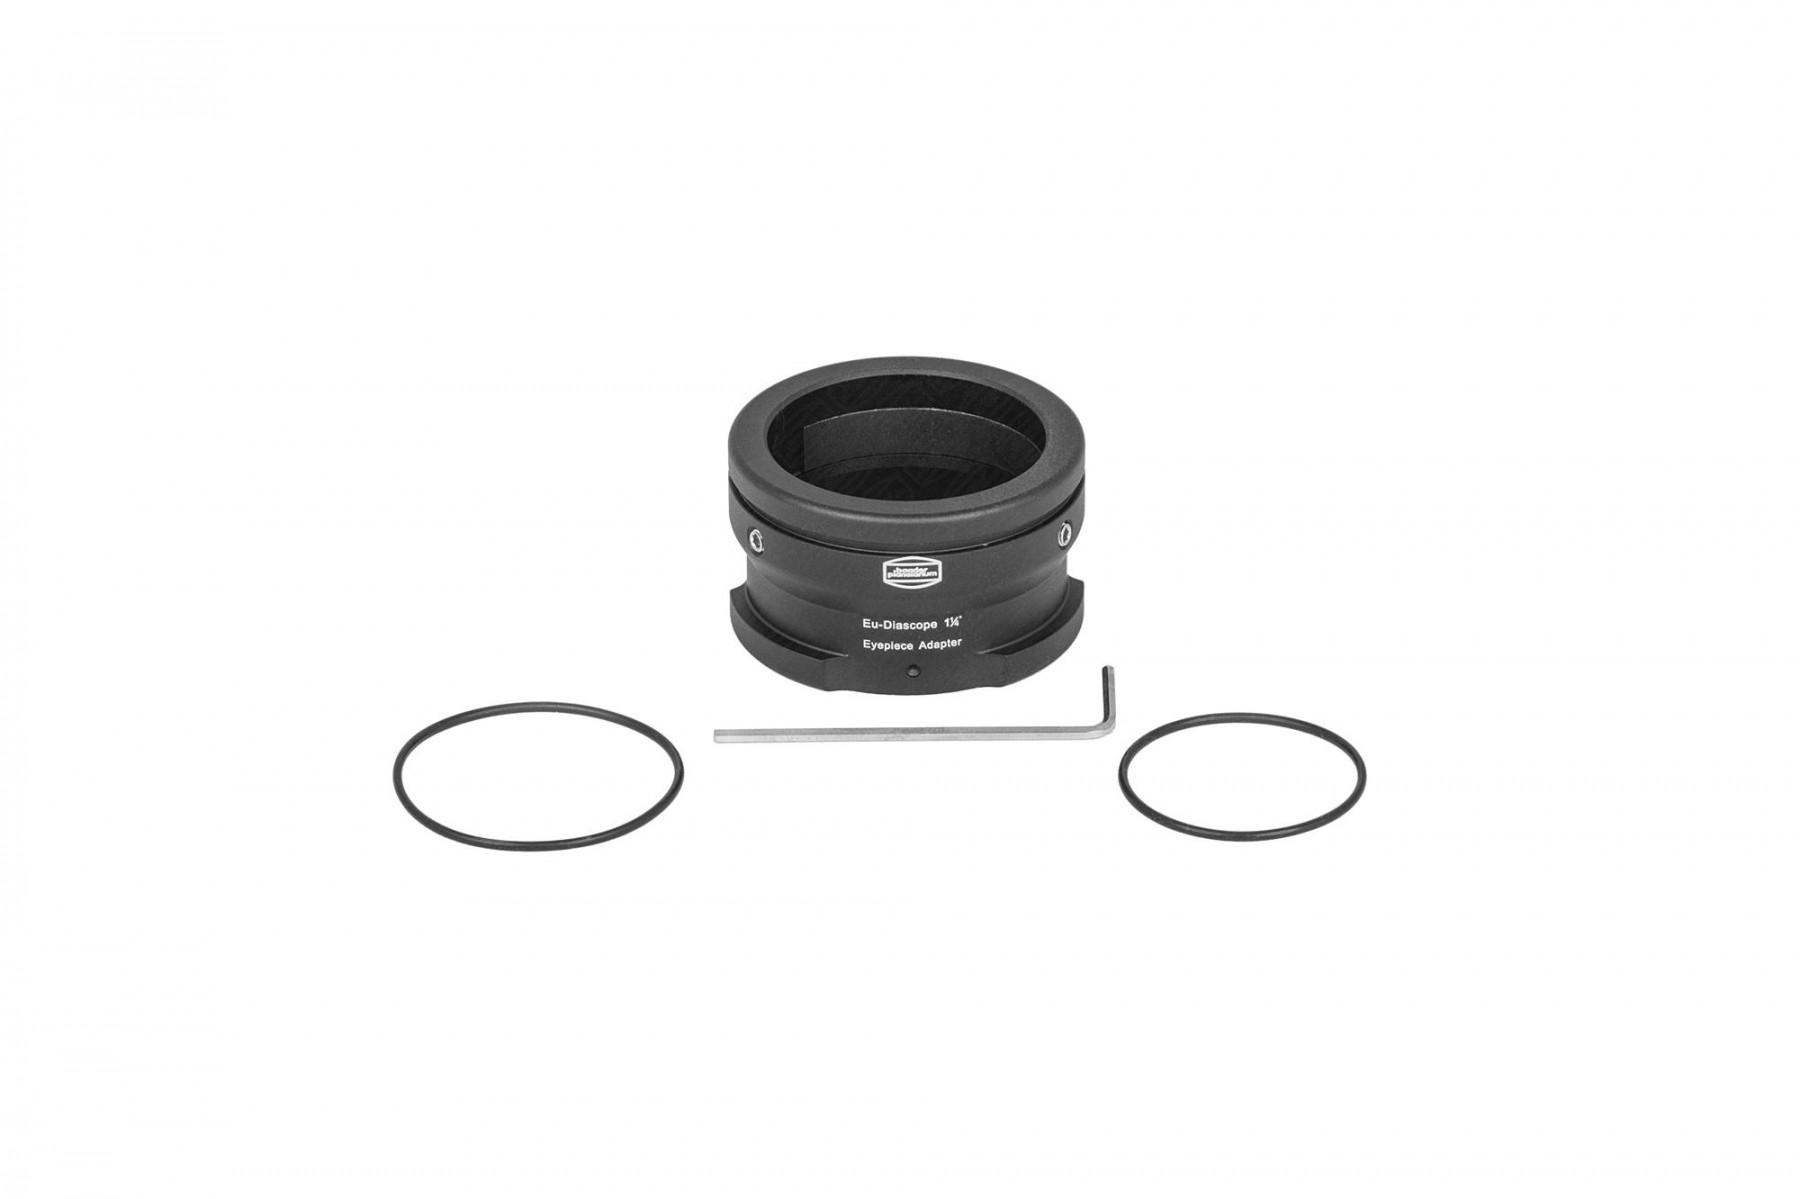 Lieferumfang: Zeiss Diascope Okularbajonett, Inbusschlüssel, 2x O-Ringe